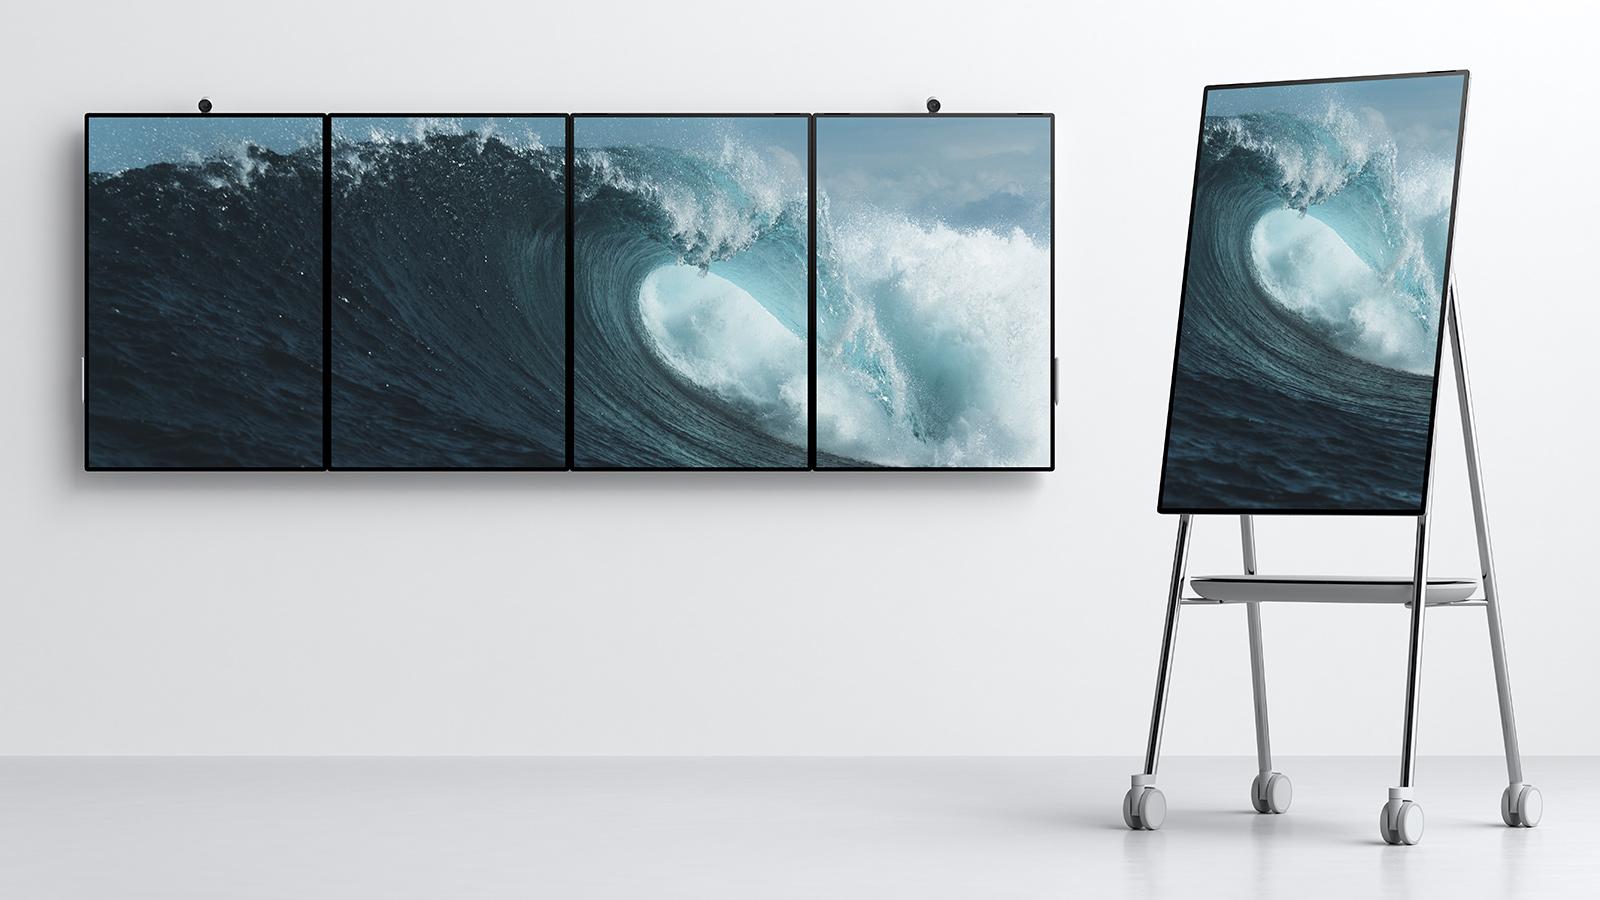 Microsoft-Surface-Hub-Store-Australia-2X-Steelcase.jpg